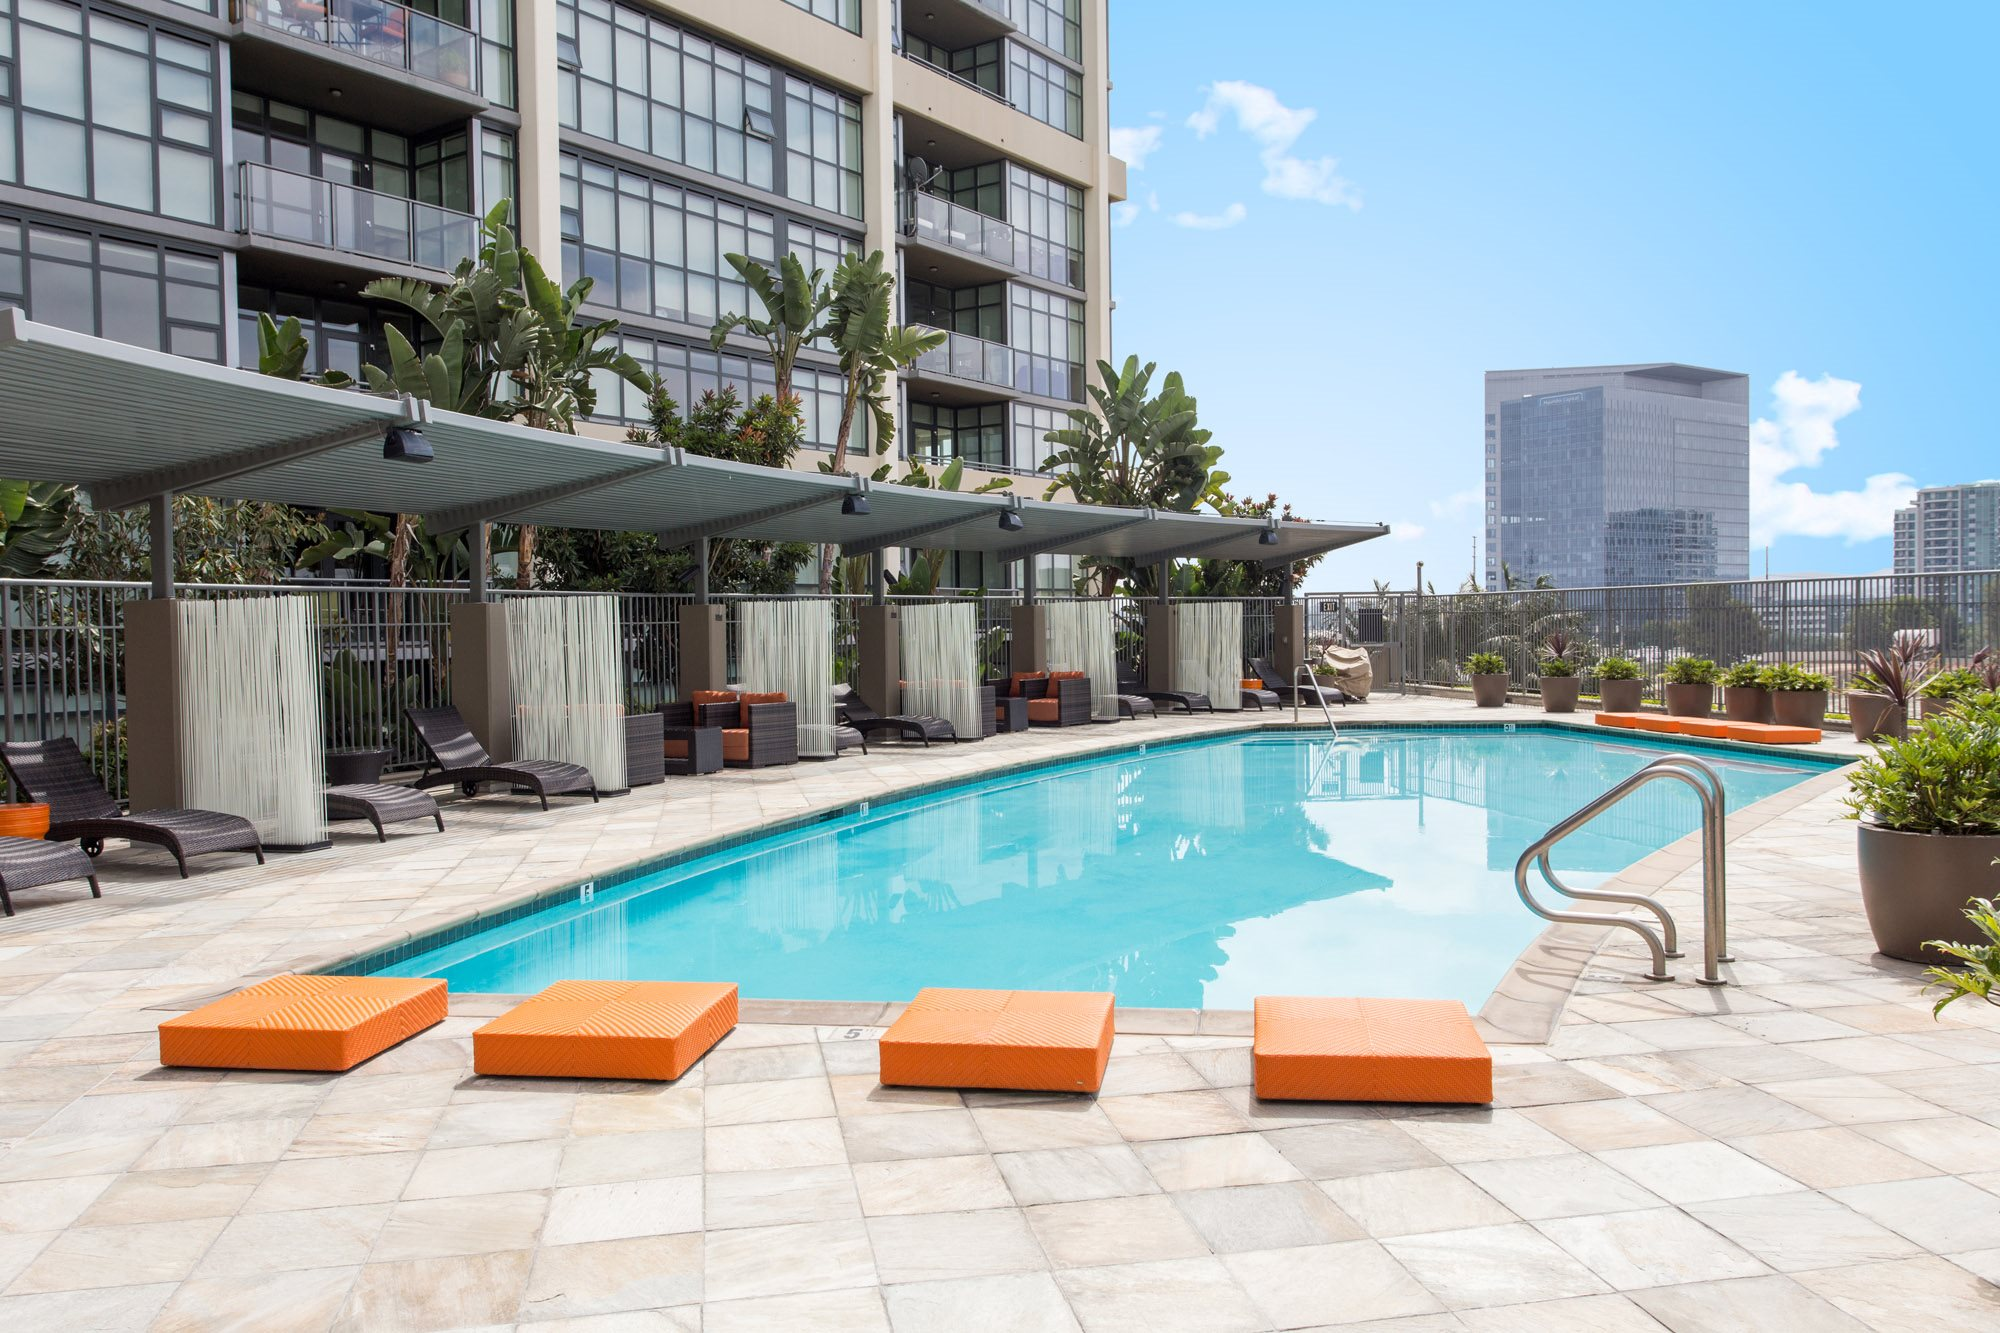 Astoria at Central Park West Apartments in Irvine, CA